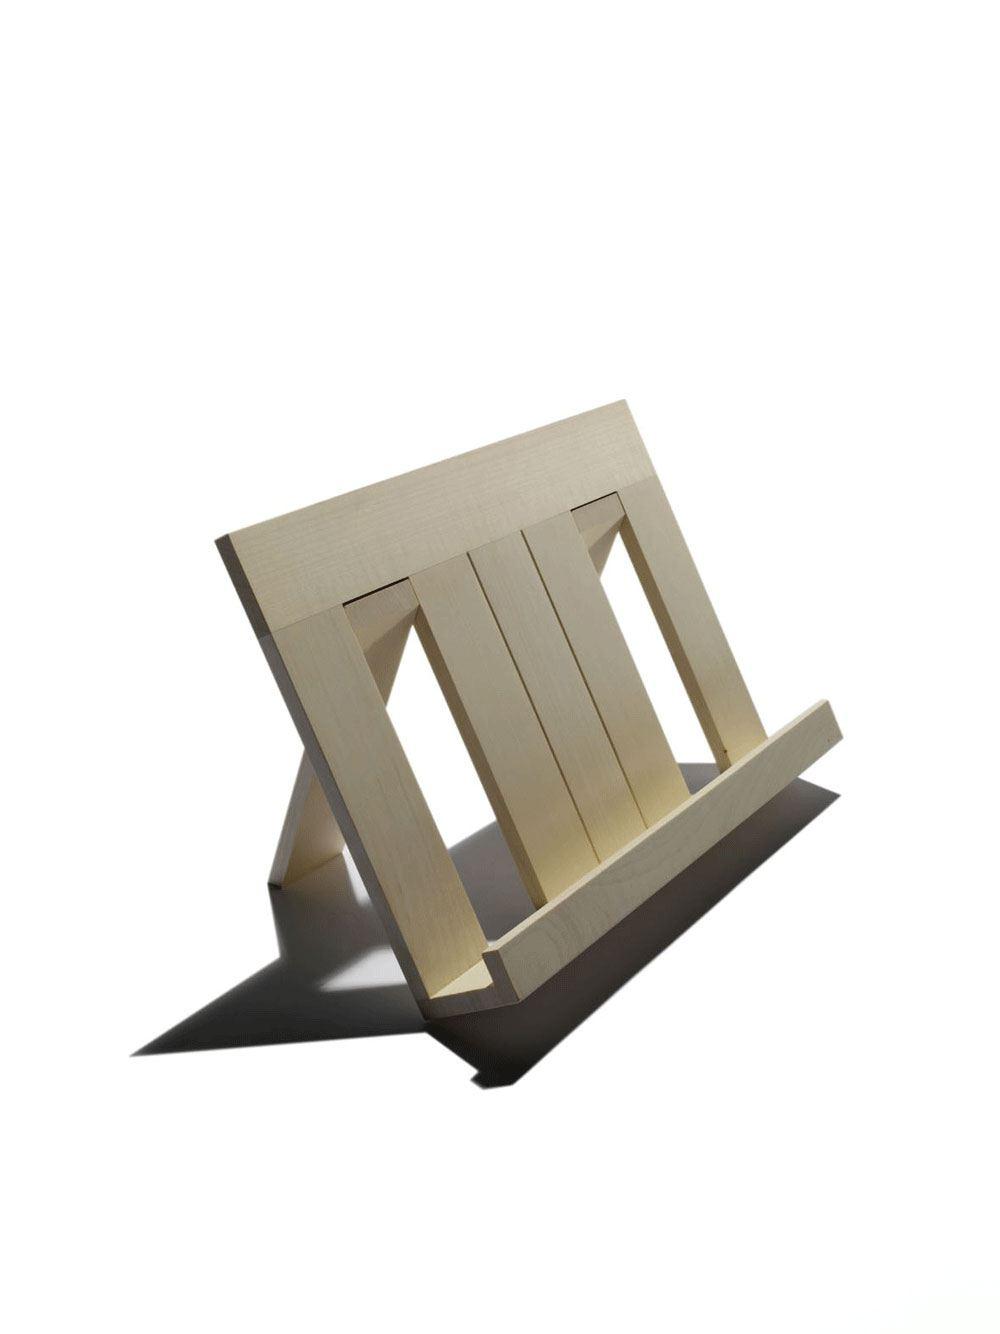 buchst nder aus holz ahorn von sidebyside design. Black Bedroom Furniture Sets. Home Design Ideas